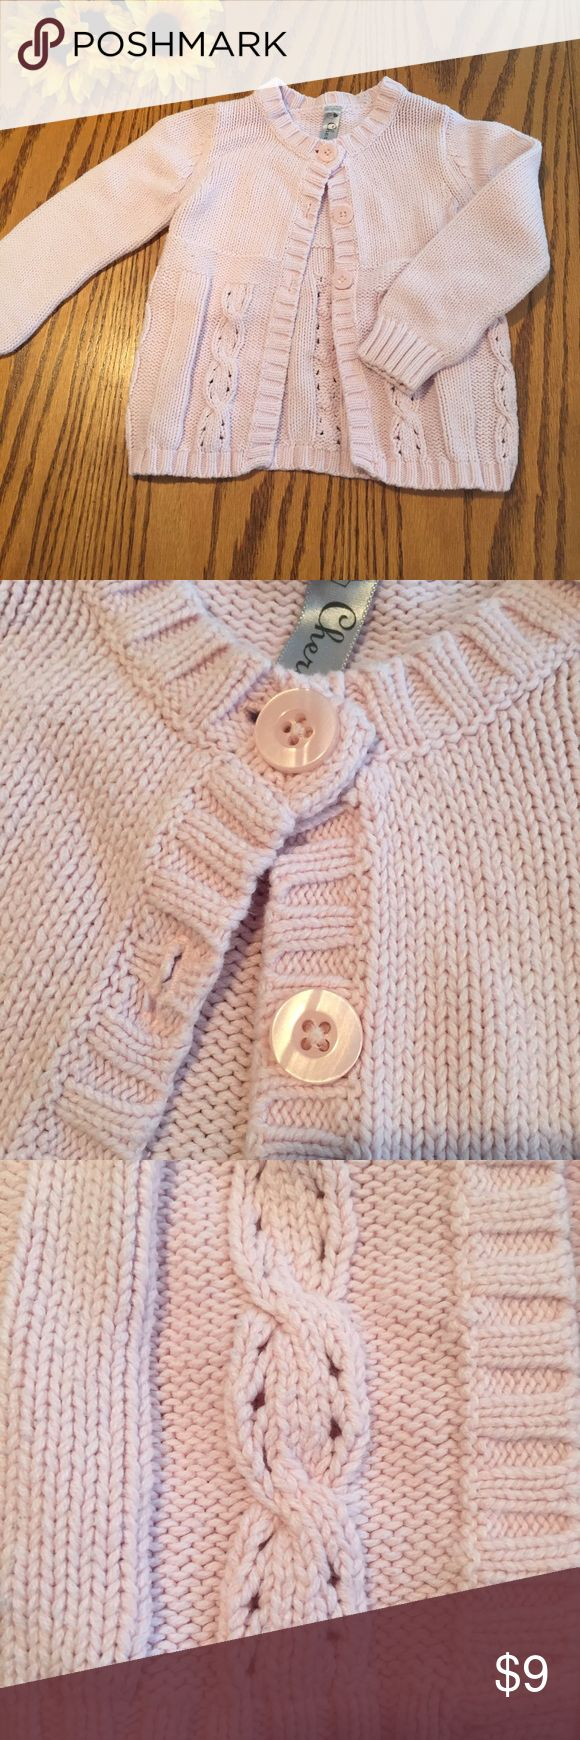 Cherokee pink cardigan sweater. Size 3t Cherokee pink cardigan sweater. Size 3t Cherokee Shirts & Tops Sweaters